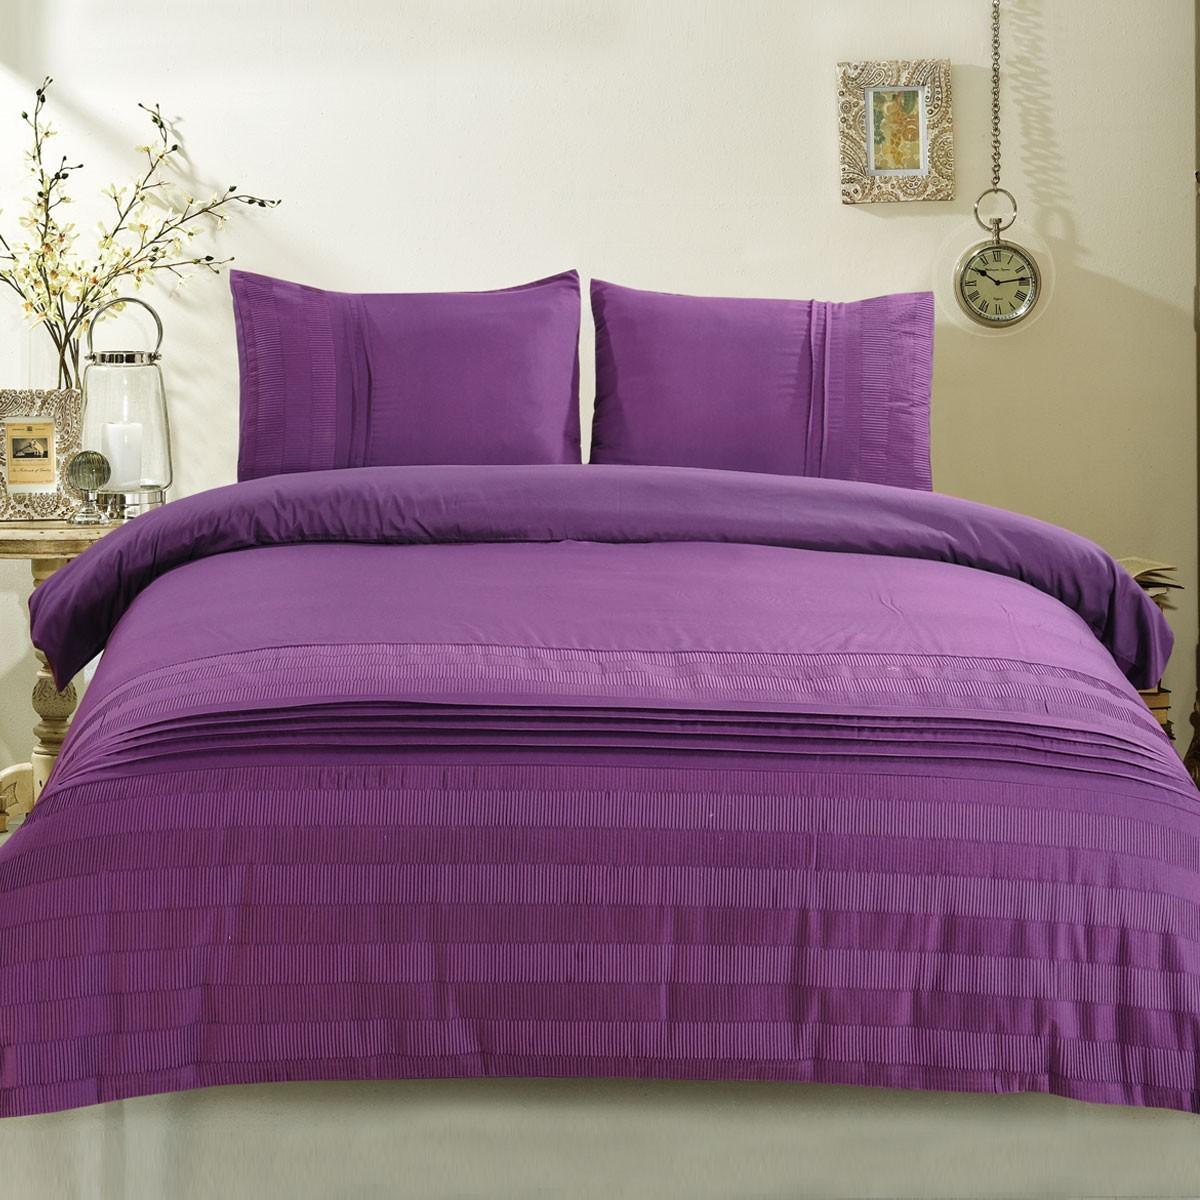 3Piece Purple Duvet Cover Set DKLJ013  Decoraport Canada